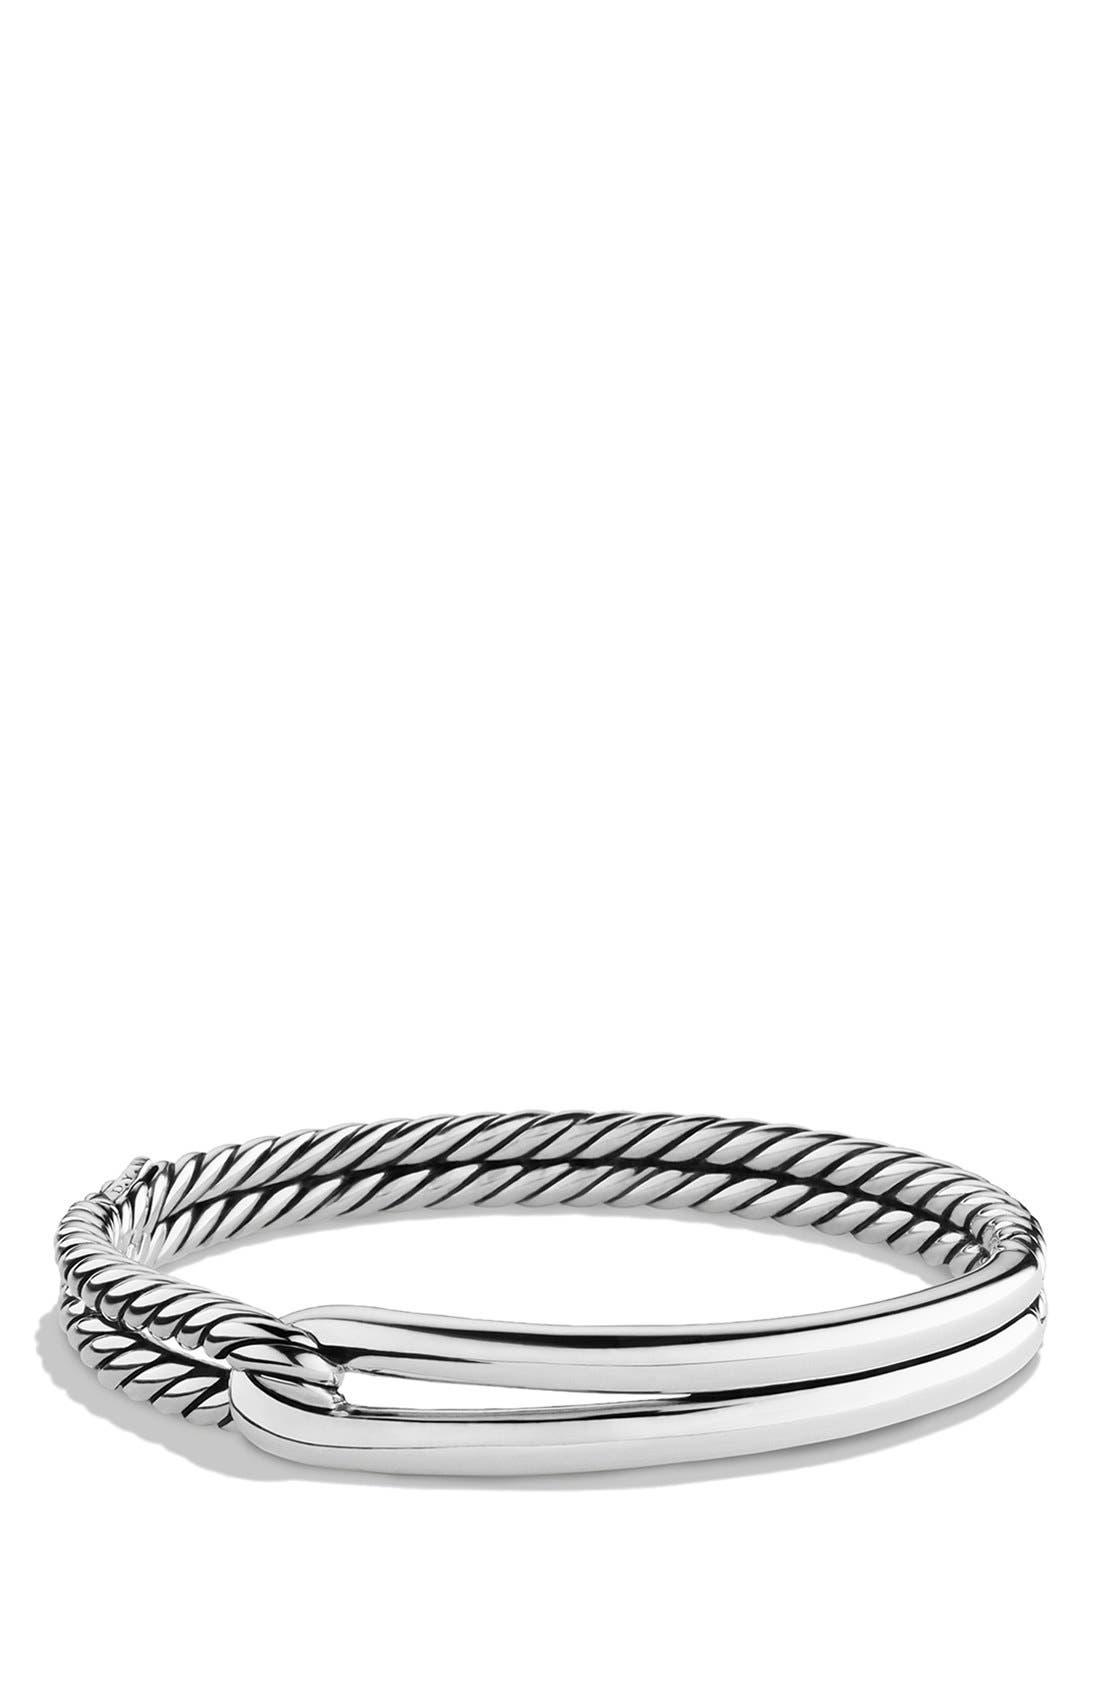 'Labyrinth' Single Loop Bracelet,                         Main,                         color, SILVER